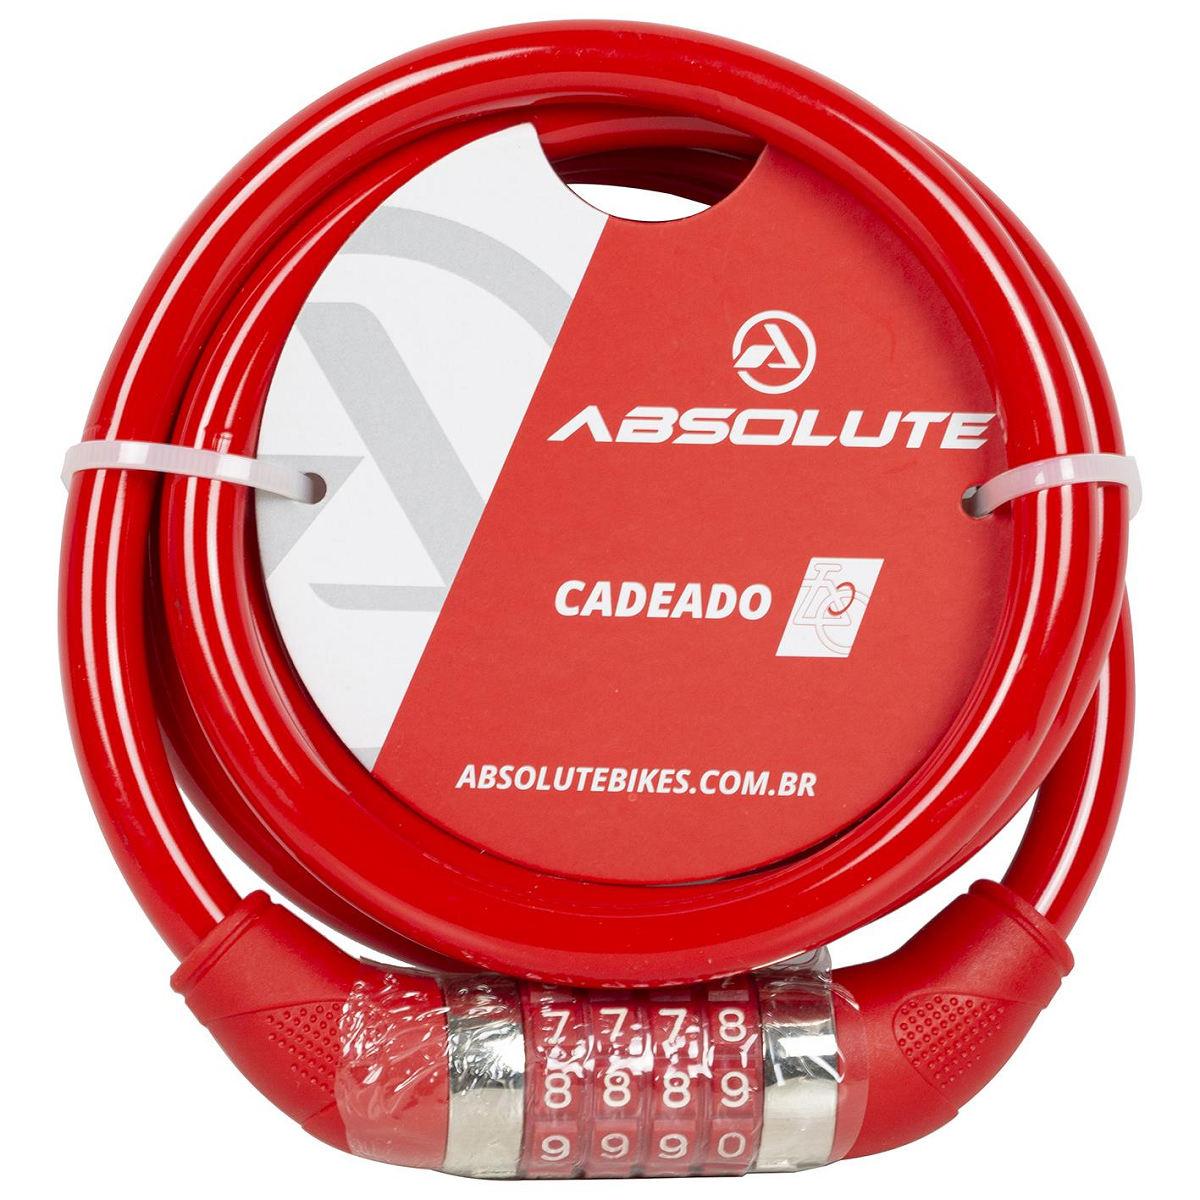 Cadeado Absolute Espiral 1,85mx12mm C Segredo Bicicleta